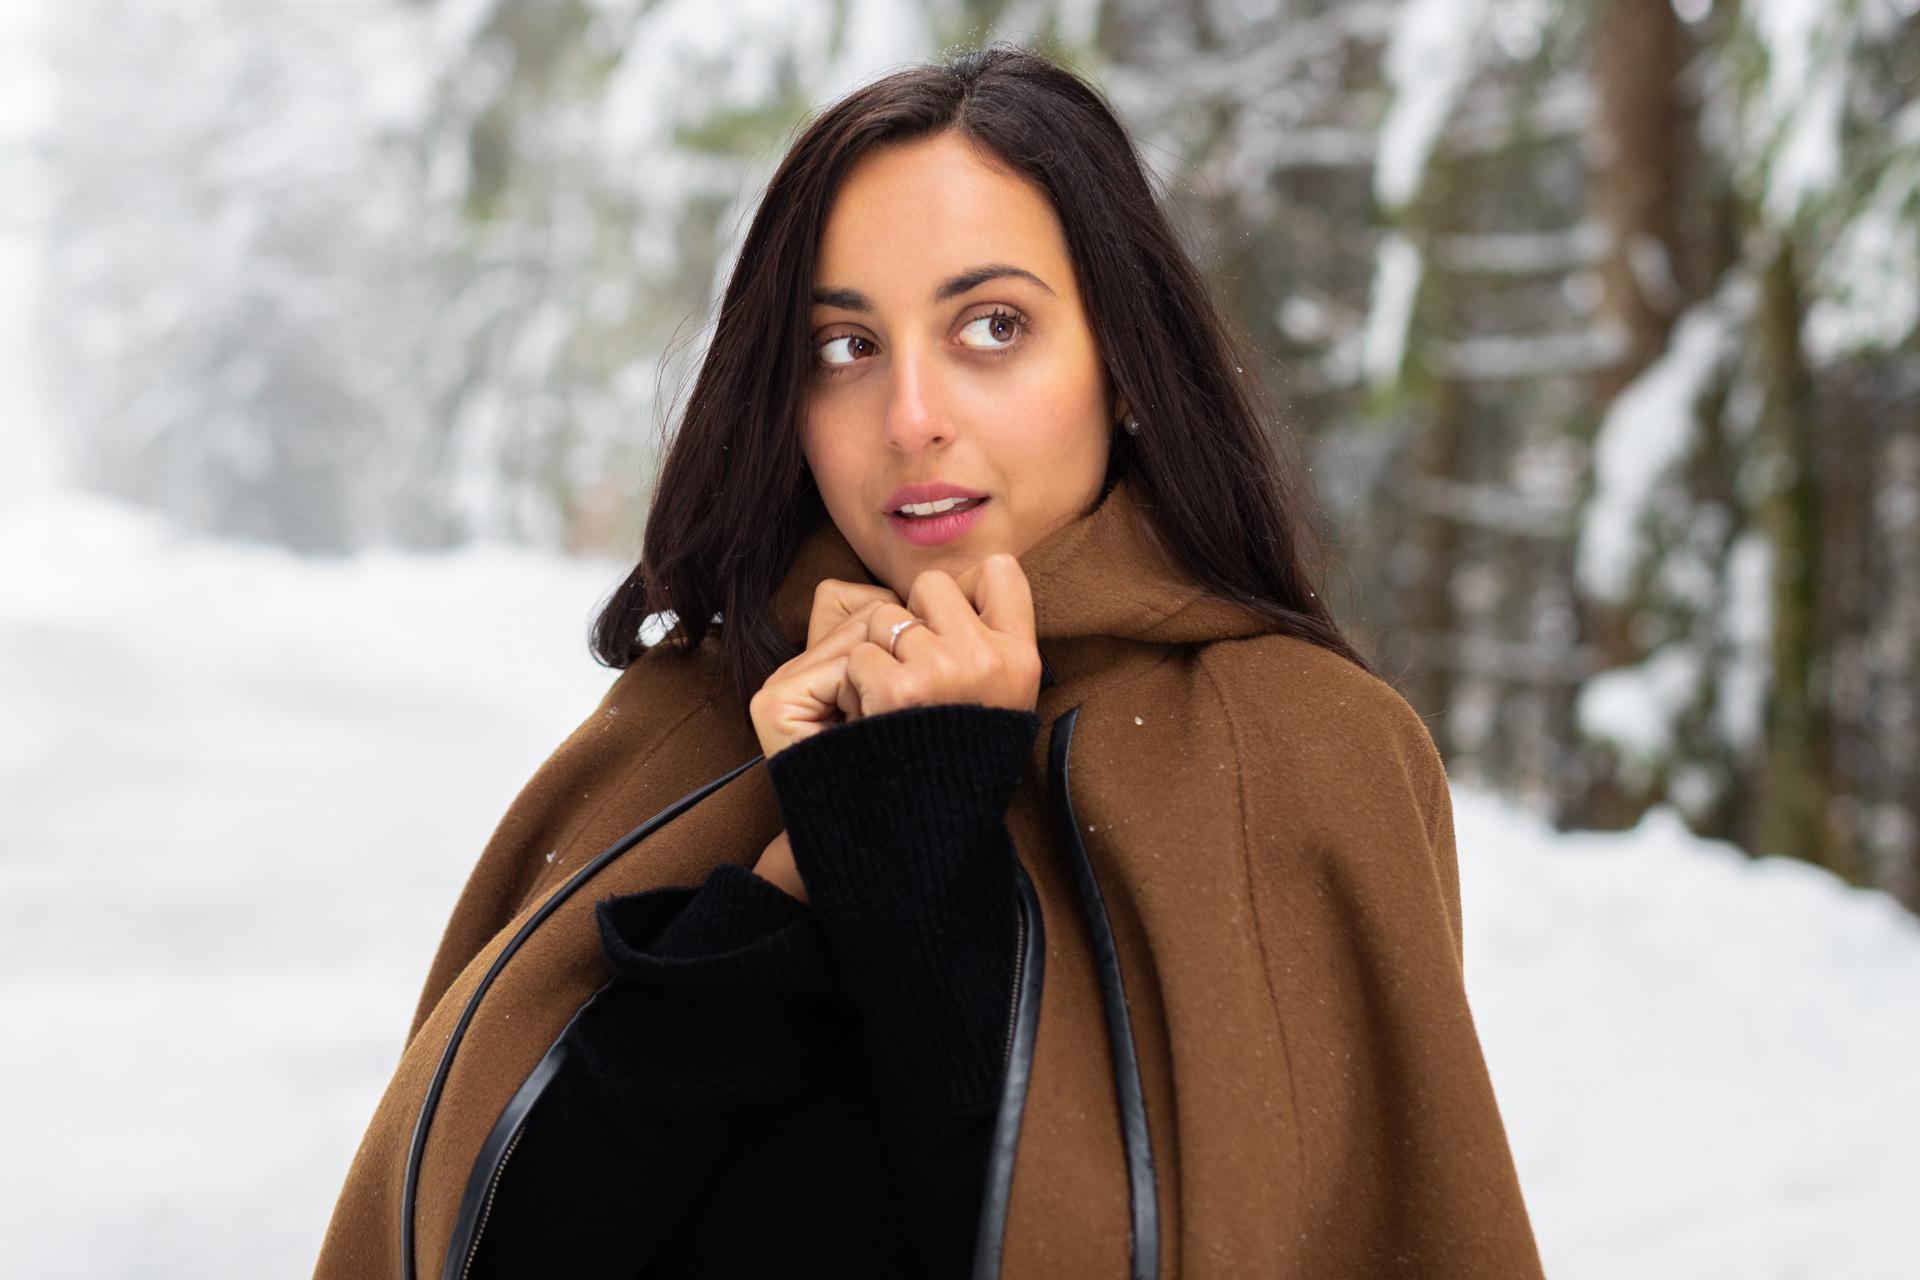 Miriam sous la neige